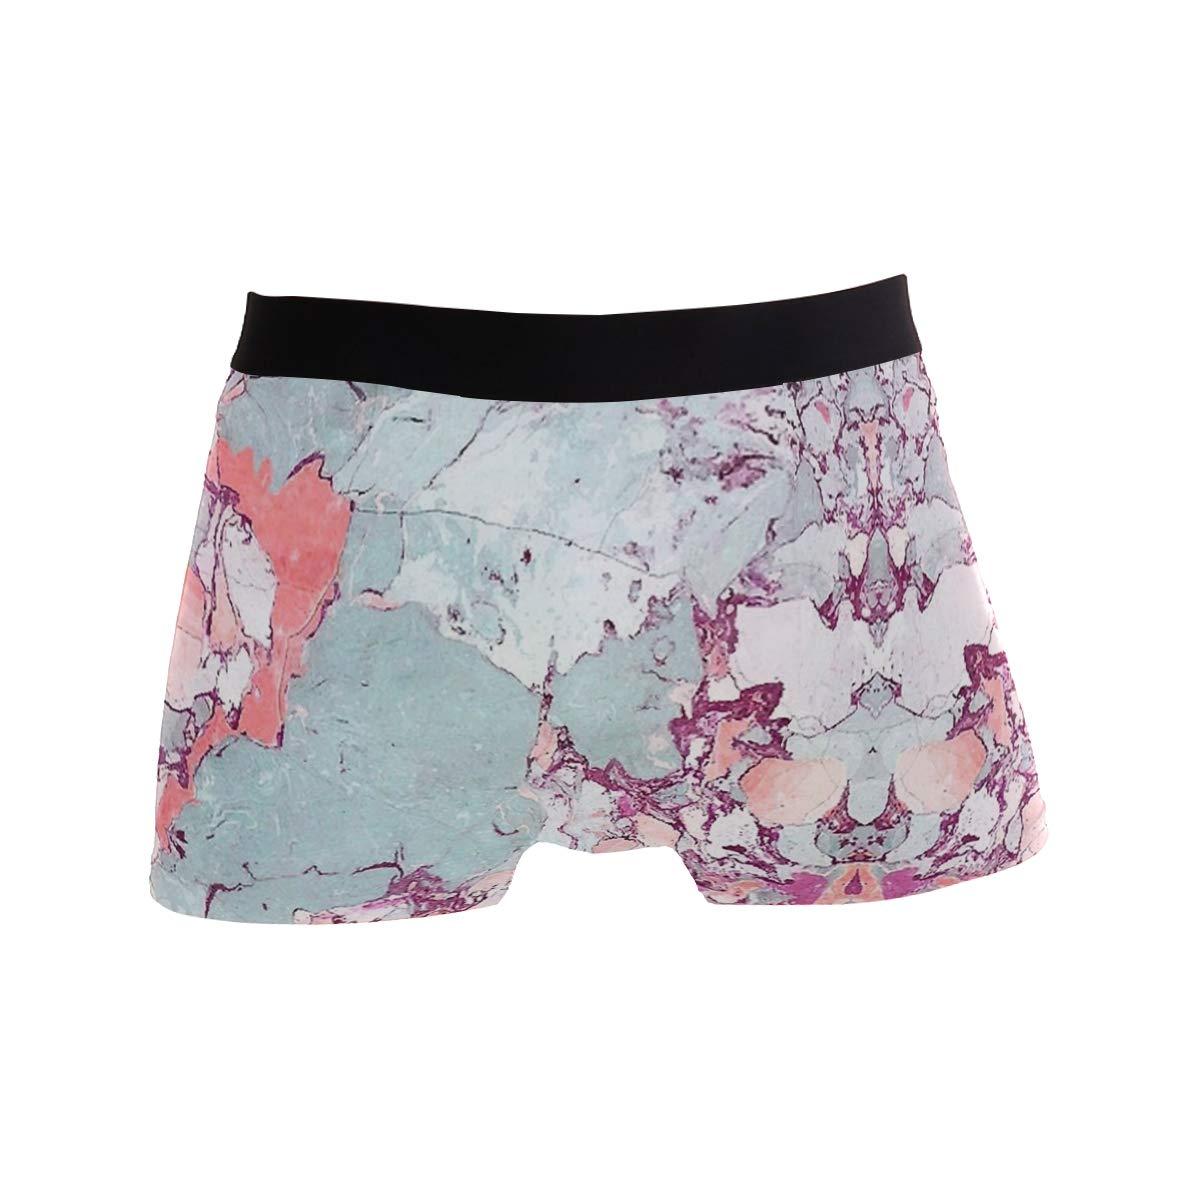 Mens Soft Breathable Marble Art Floral Underwear Boxer Briefs